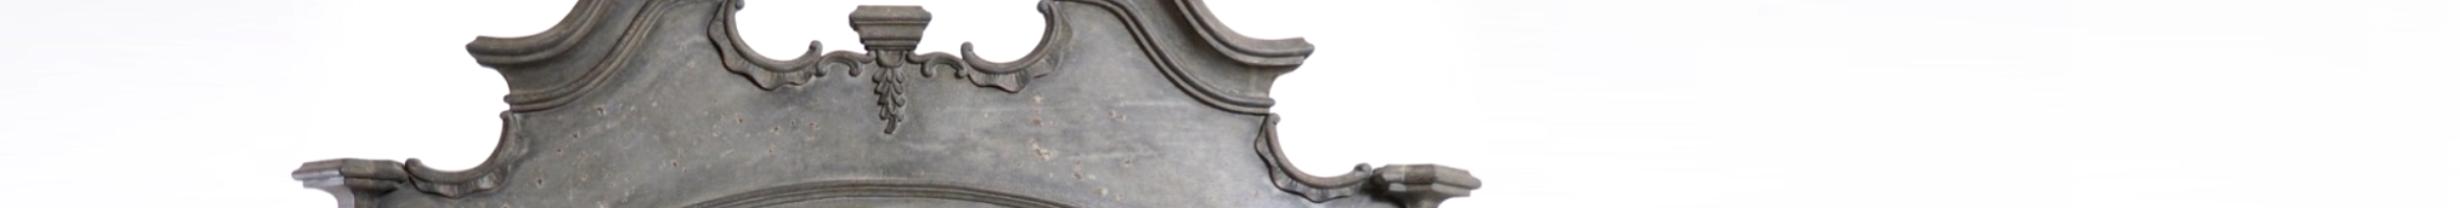 Gustavian cabinet test foto.png